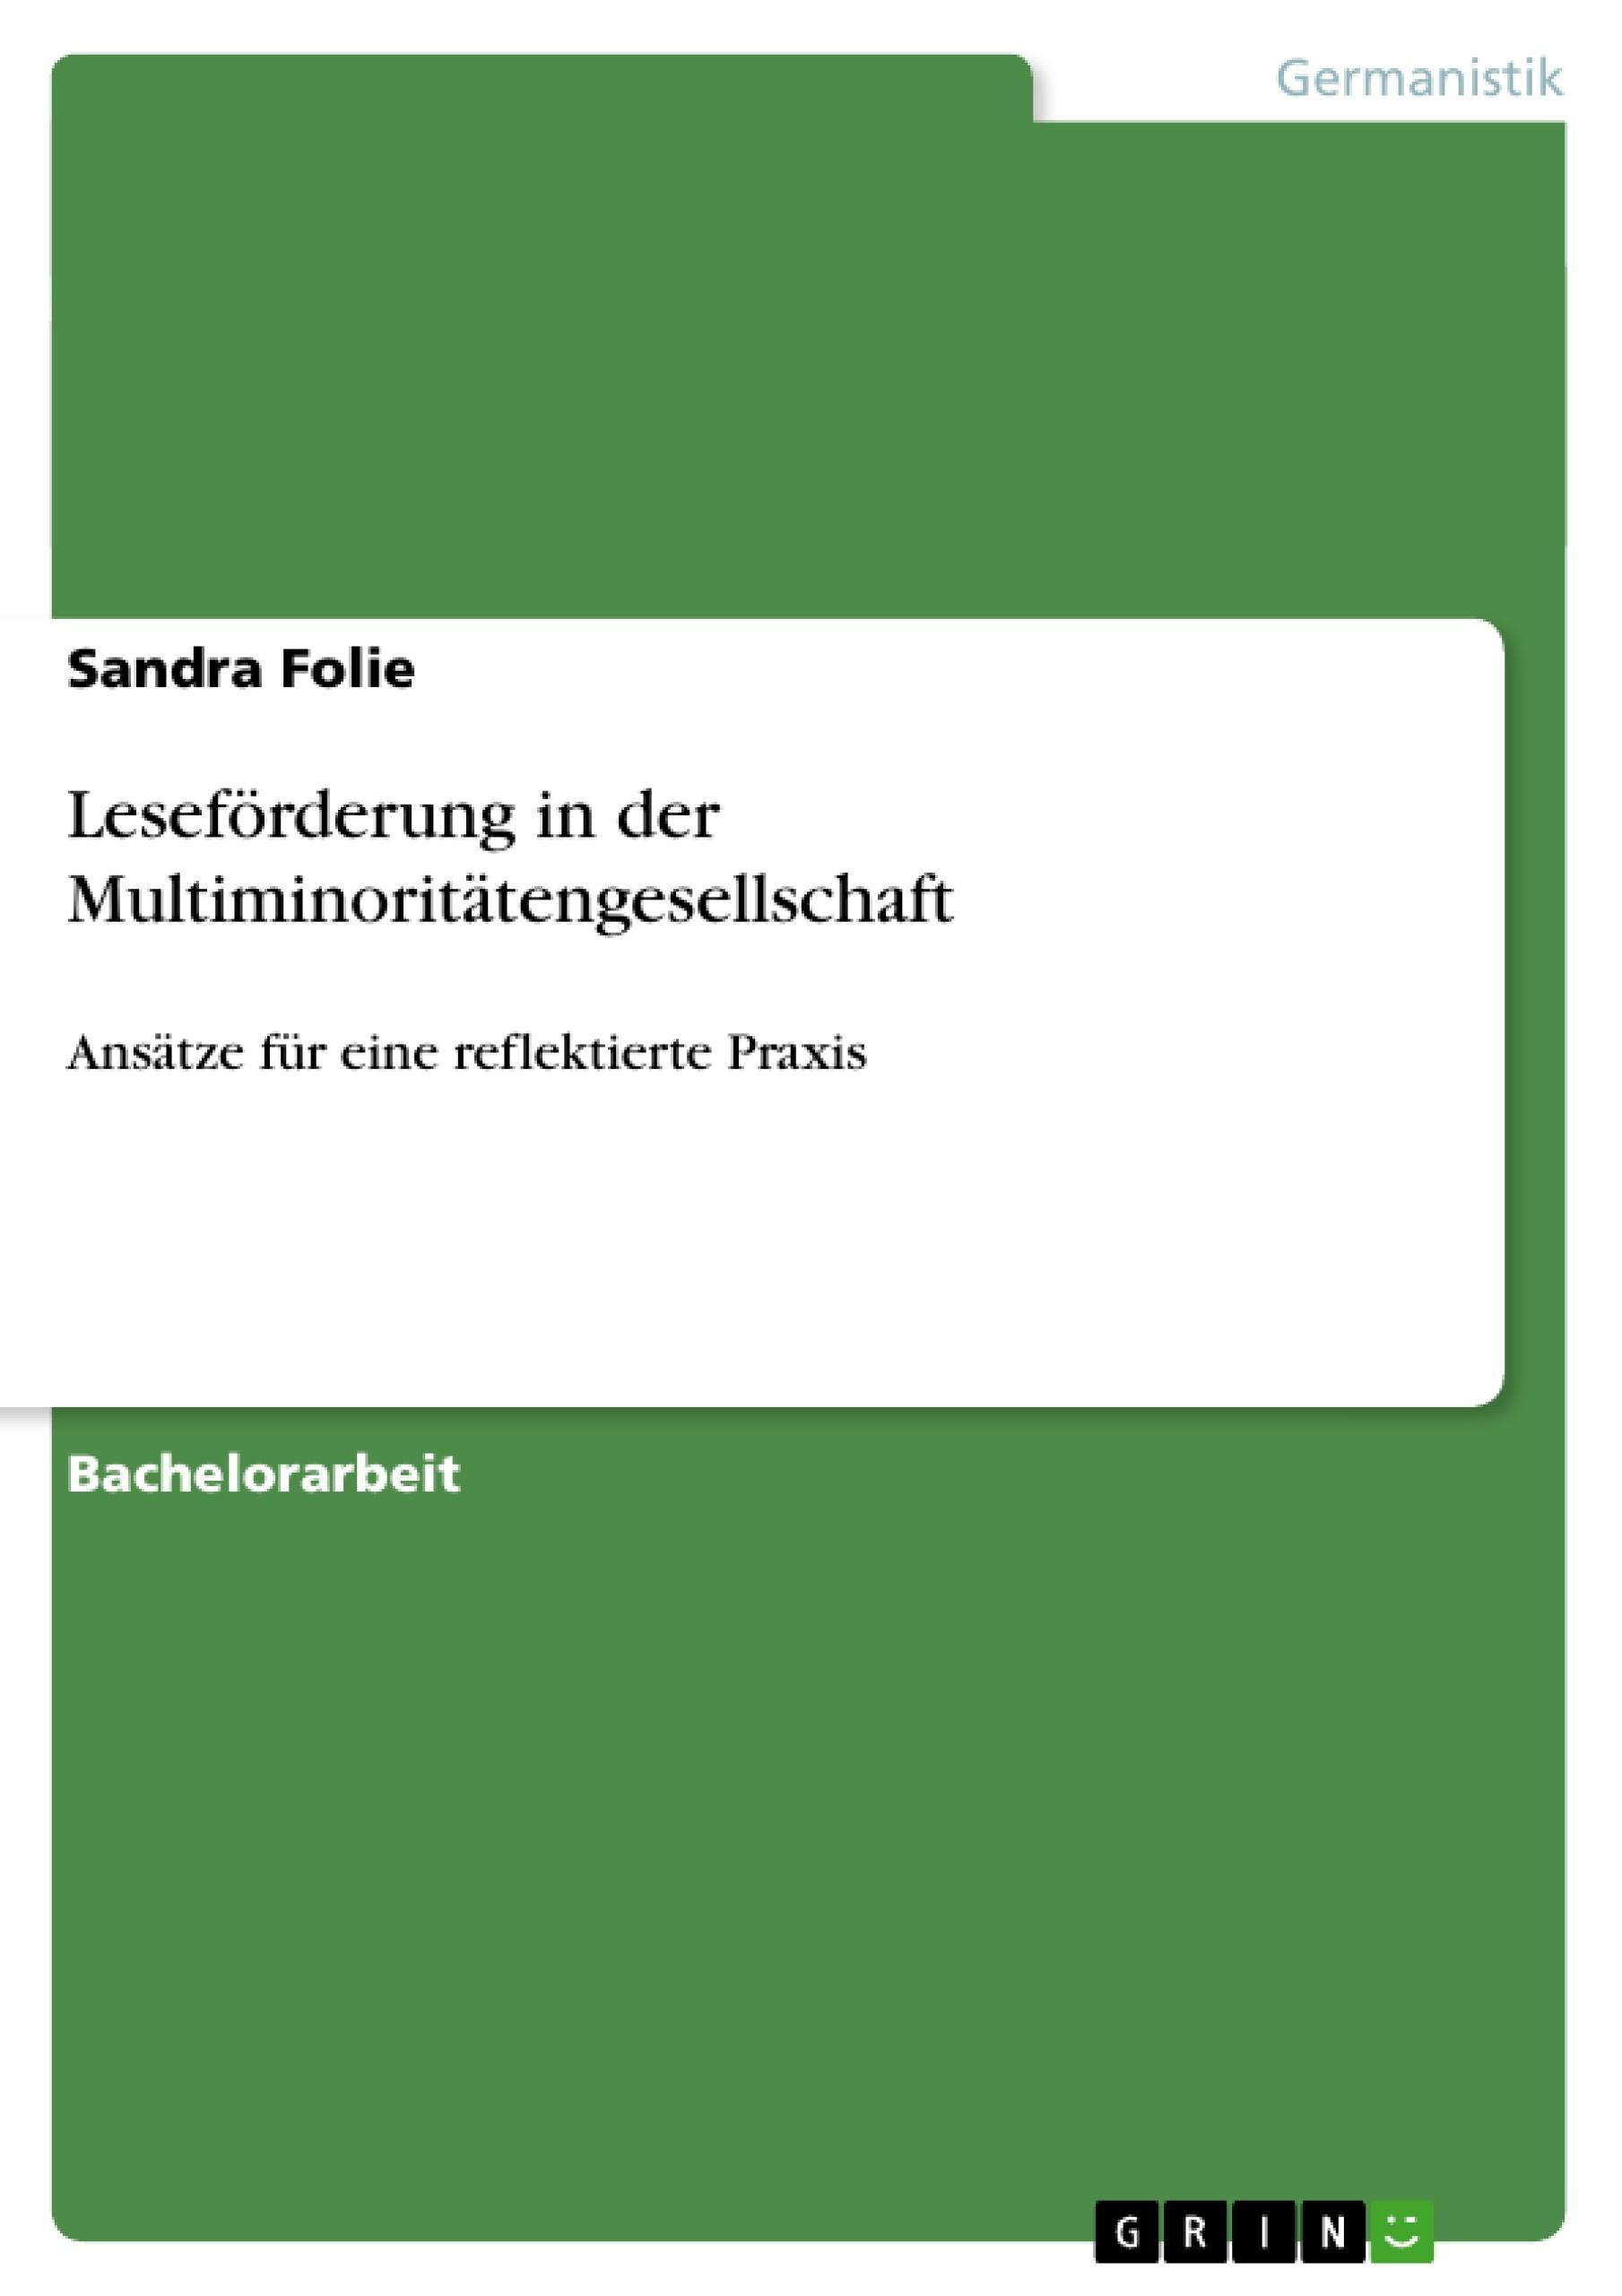 Titel: Leseförderung in der Multiminoritätengesellschaft